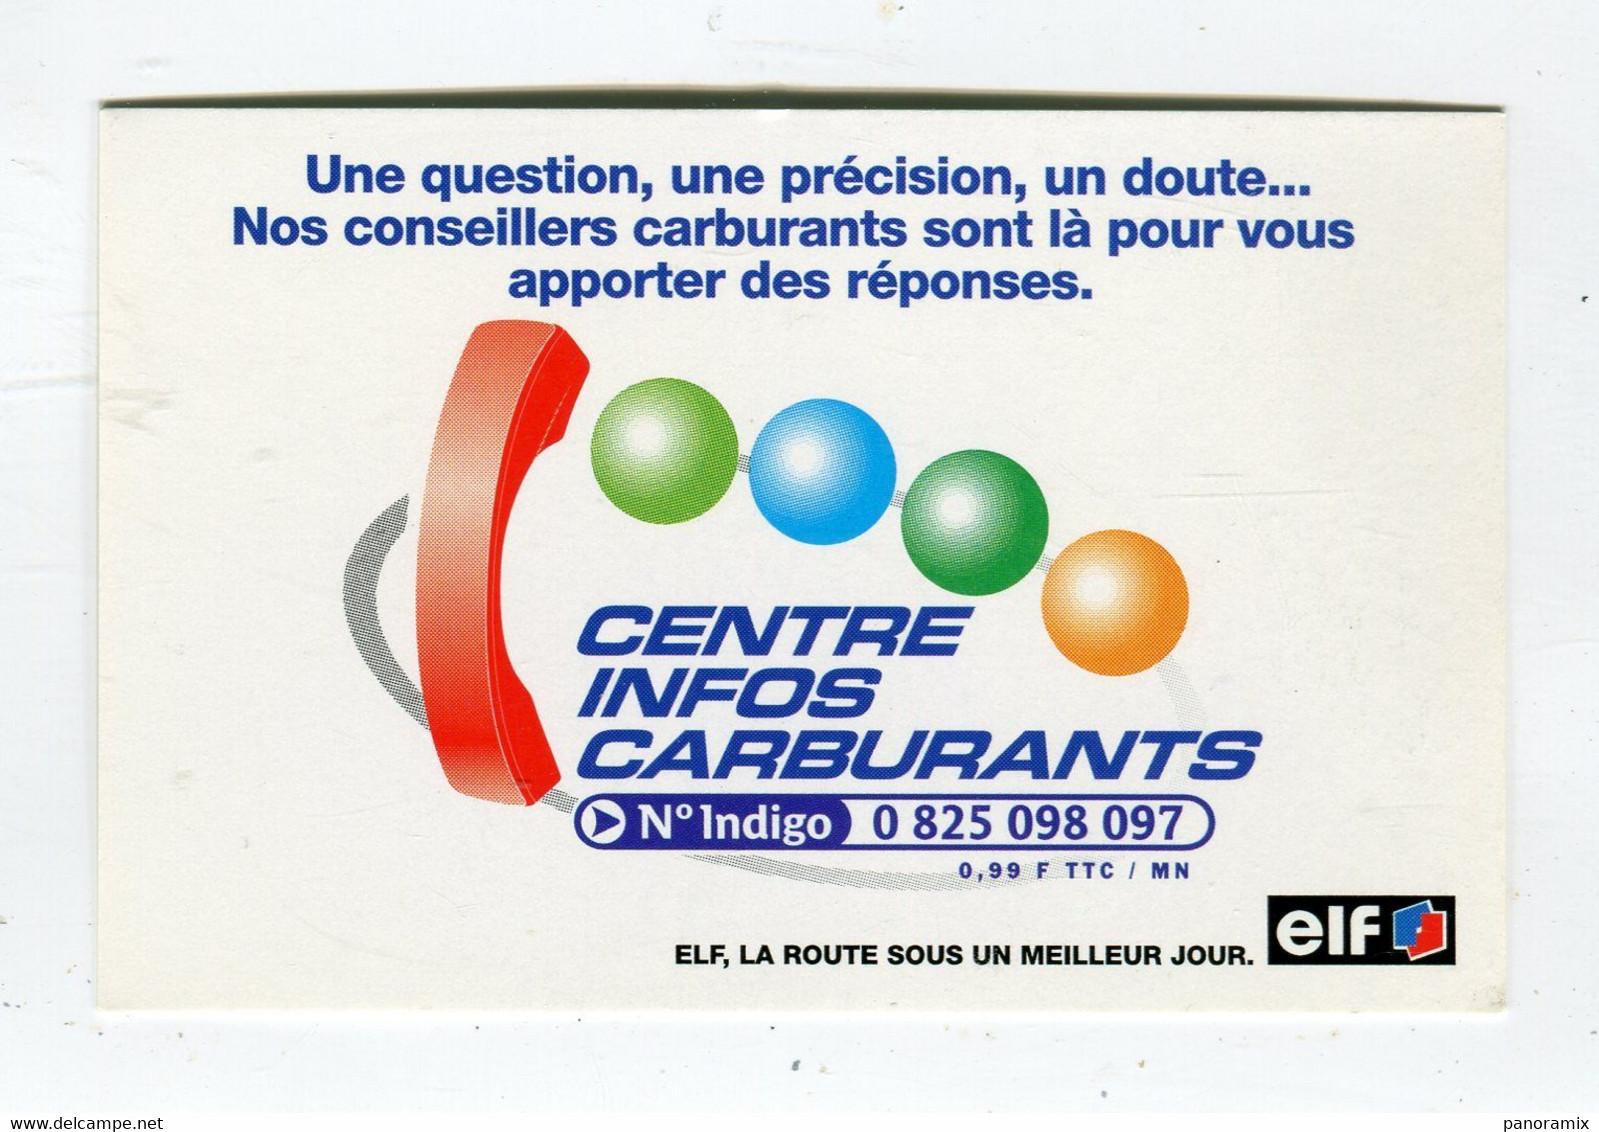 Carte De Visite °_ Carton-Elf-Centre Infos Carburants-0825 - Visiting Cards